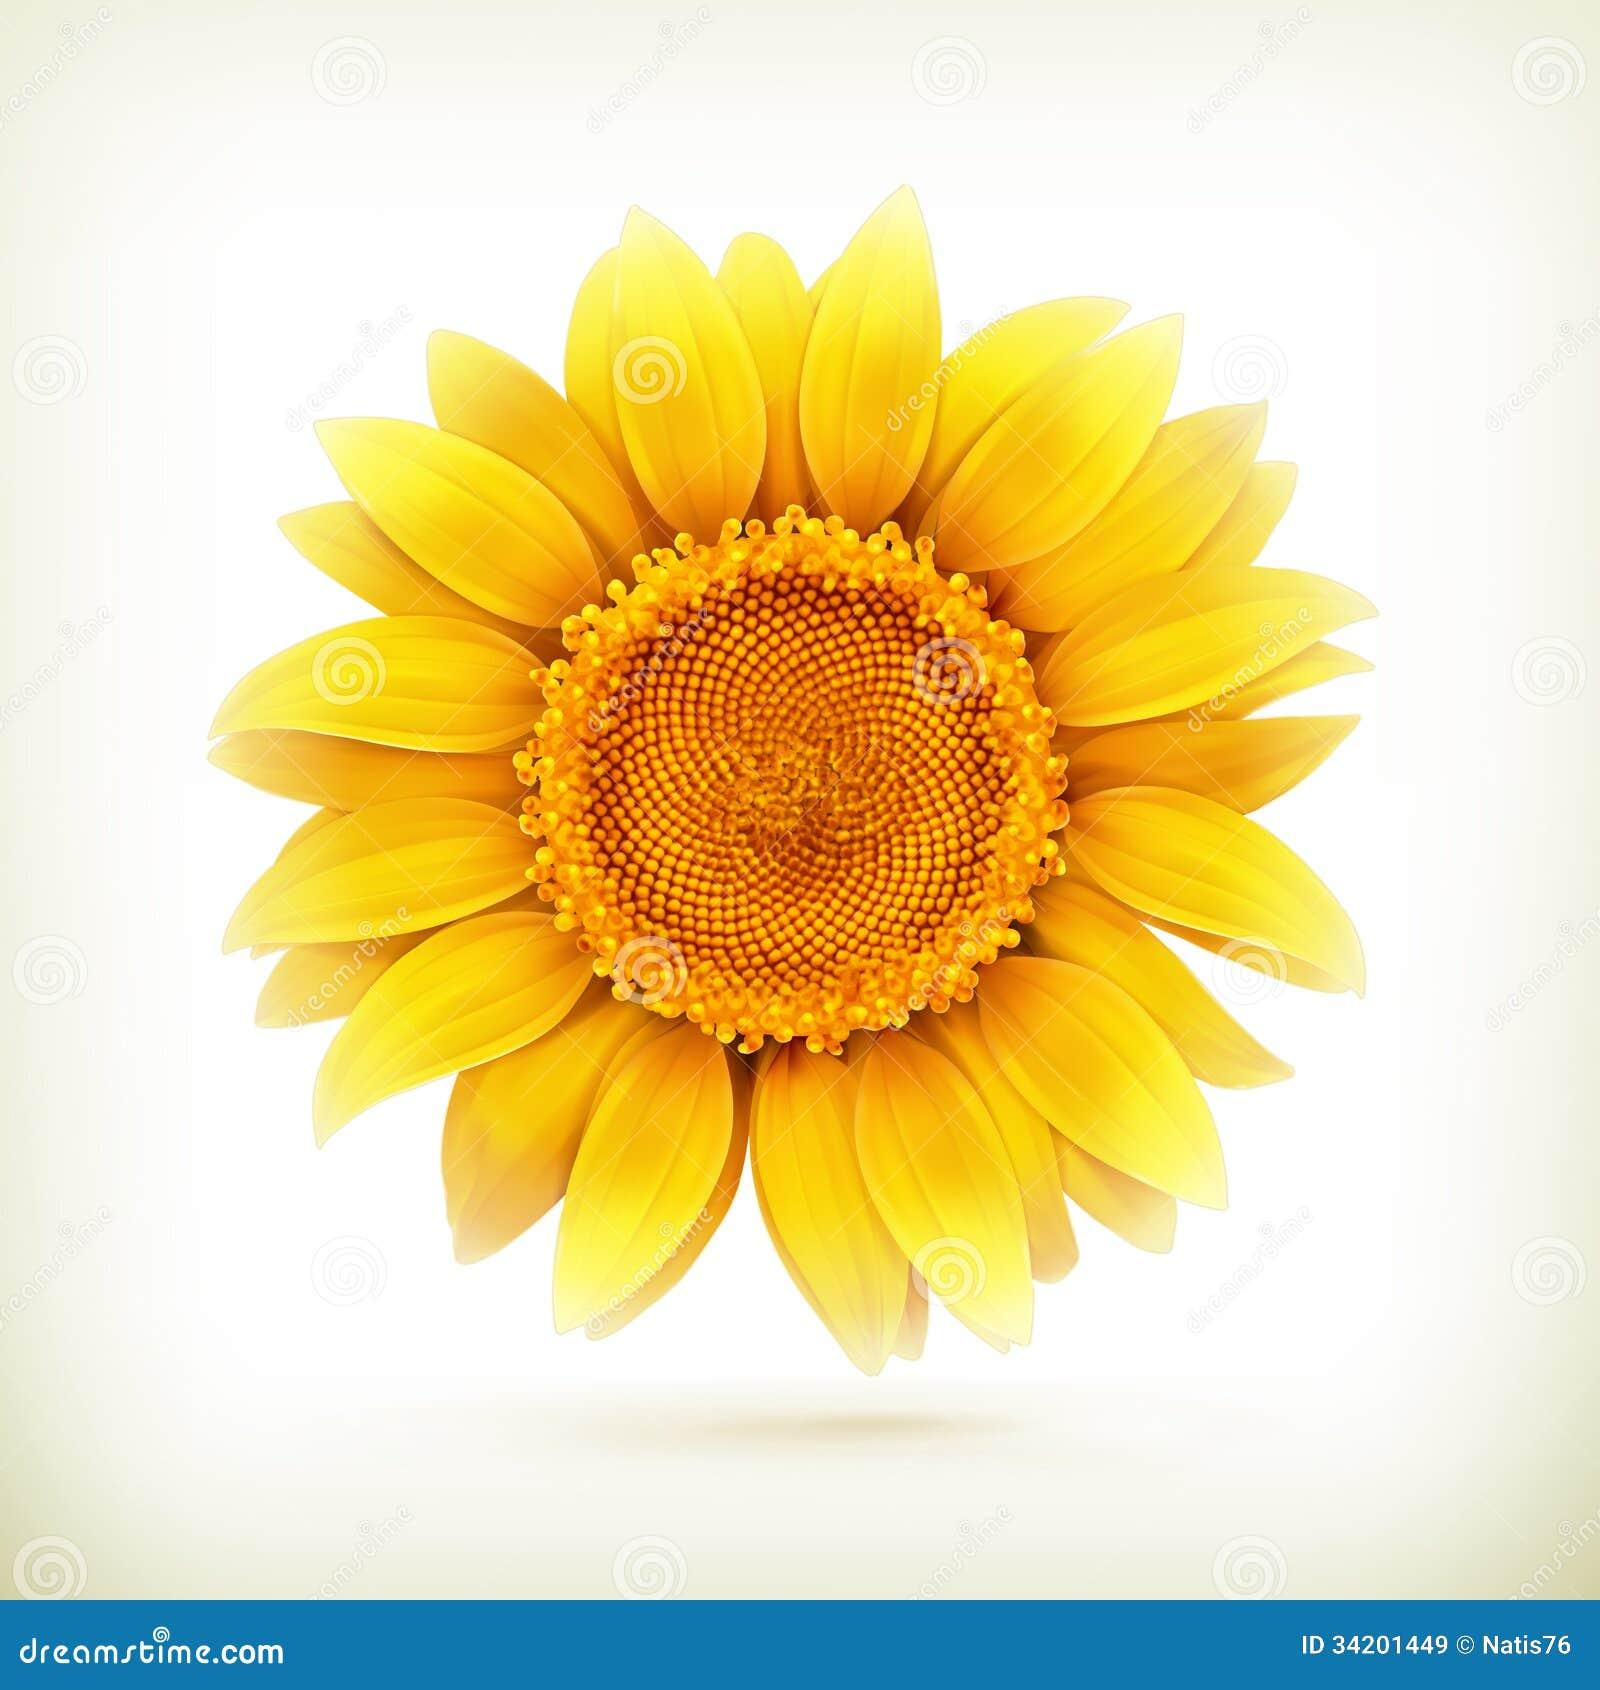 Sunflower Royalty Free Stock Images - Image: 34201449